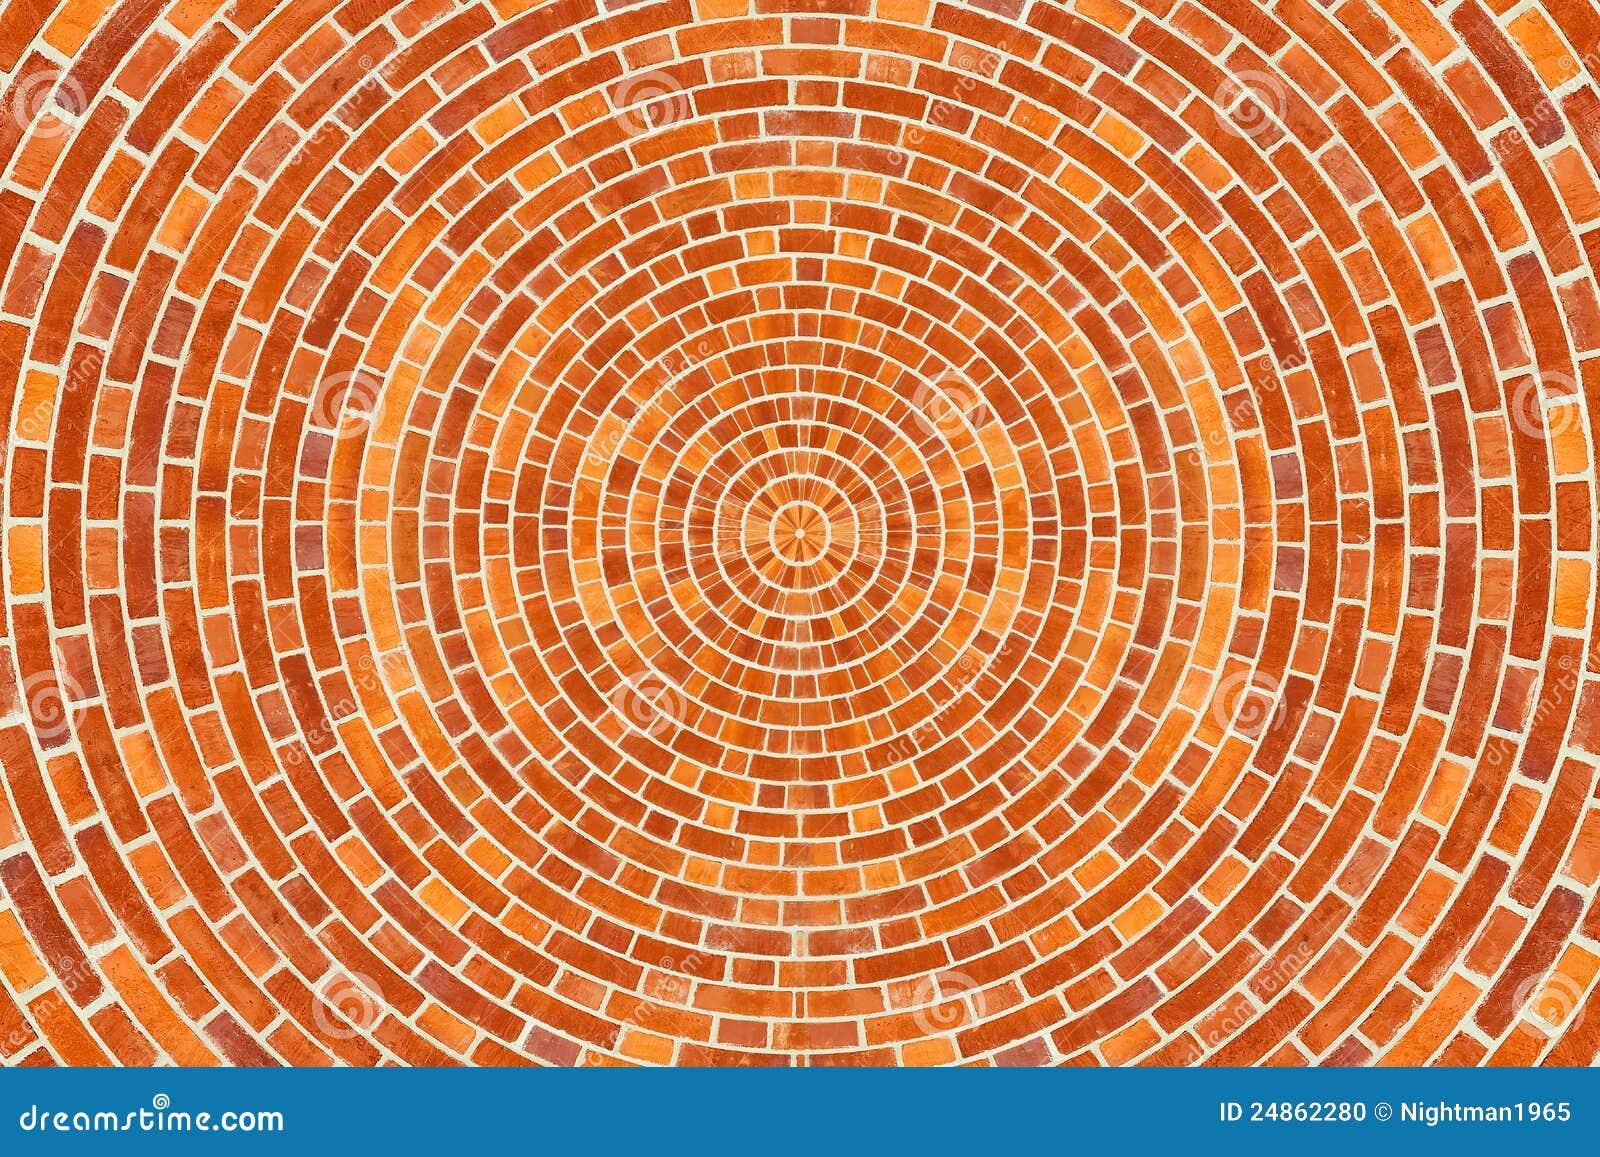 Circular Brick Pattern Stock Photo Image 24862280